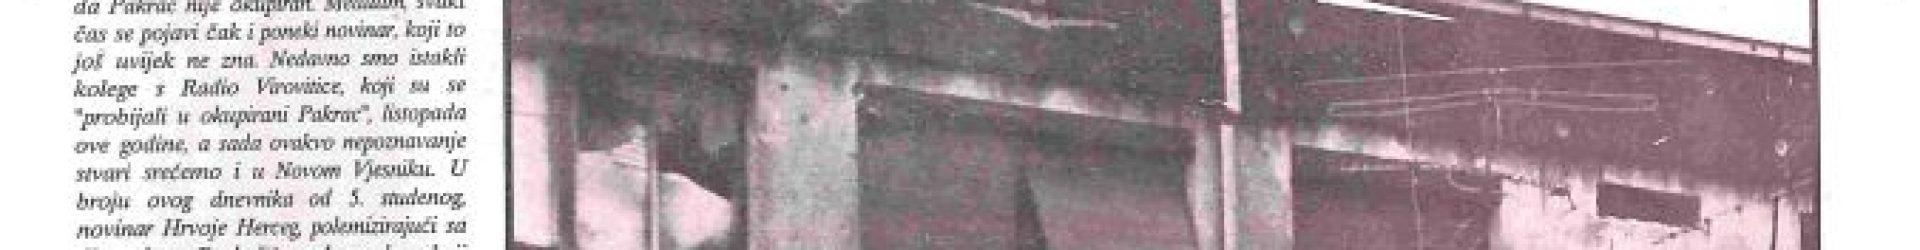 2019-03-11 13_30_26-Pakrački list broj 11. Datum 19.11.1992..pdf - Foxit Reader